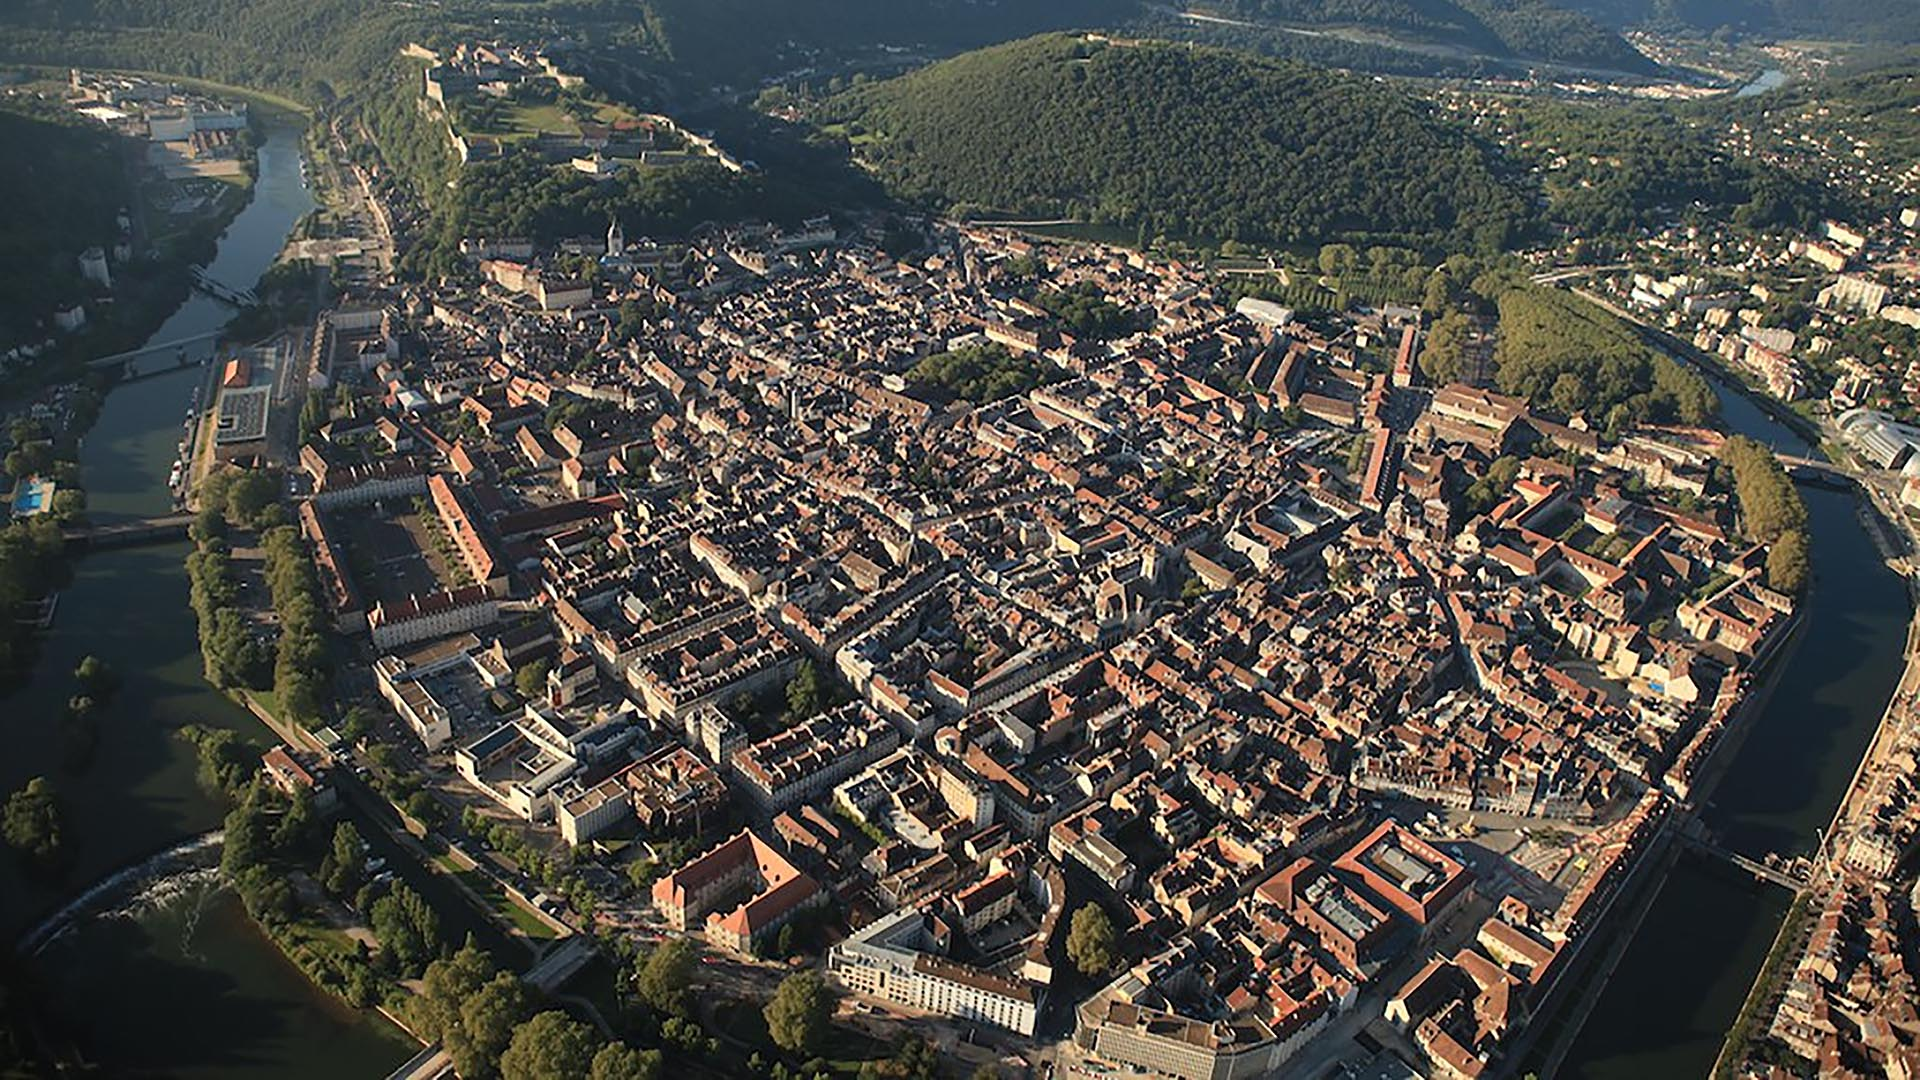 https://media.habiteo.com/images/residence_new/253/vue-panoramique-de-besancon-%2825%29.jpg?v=2